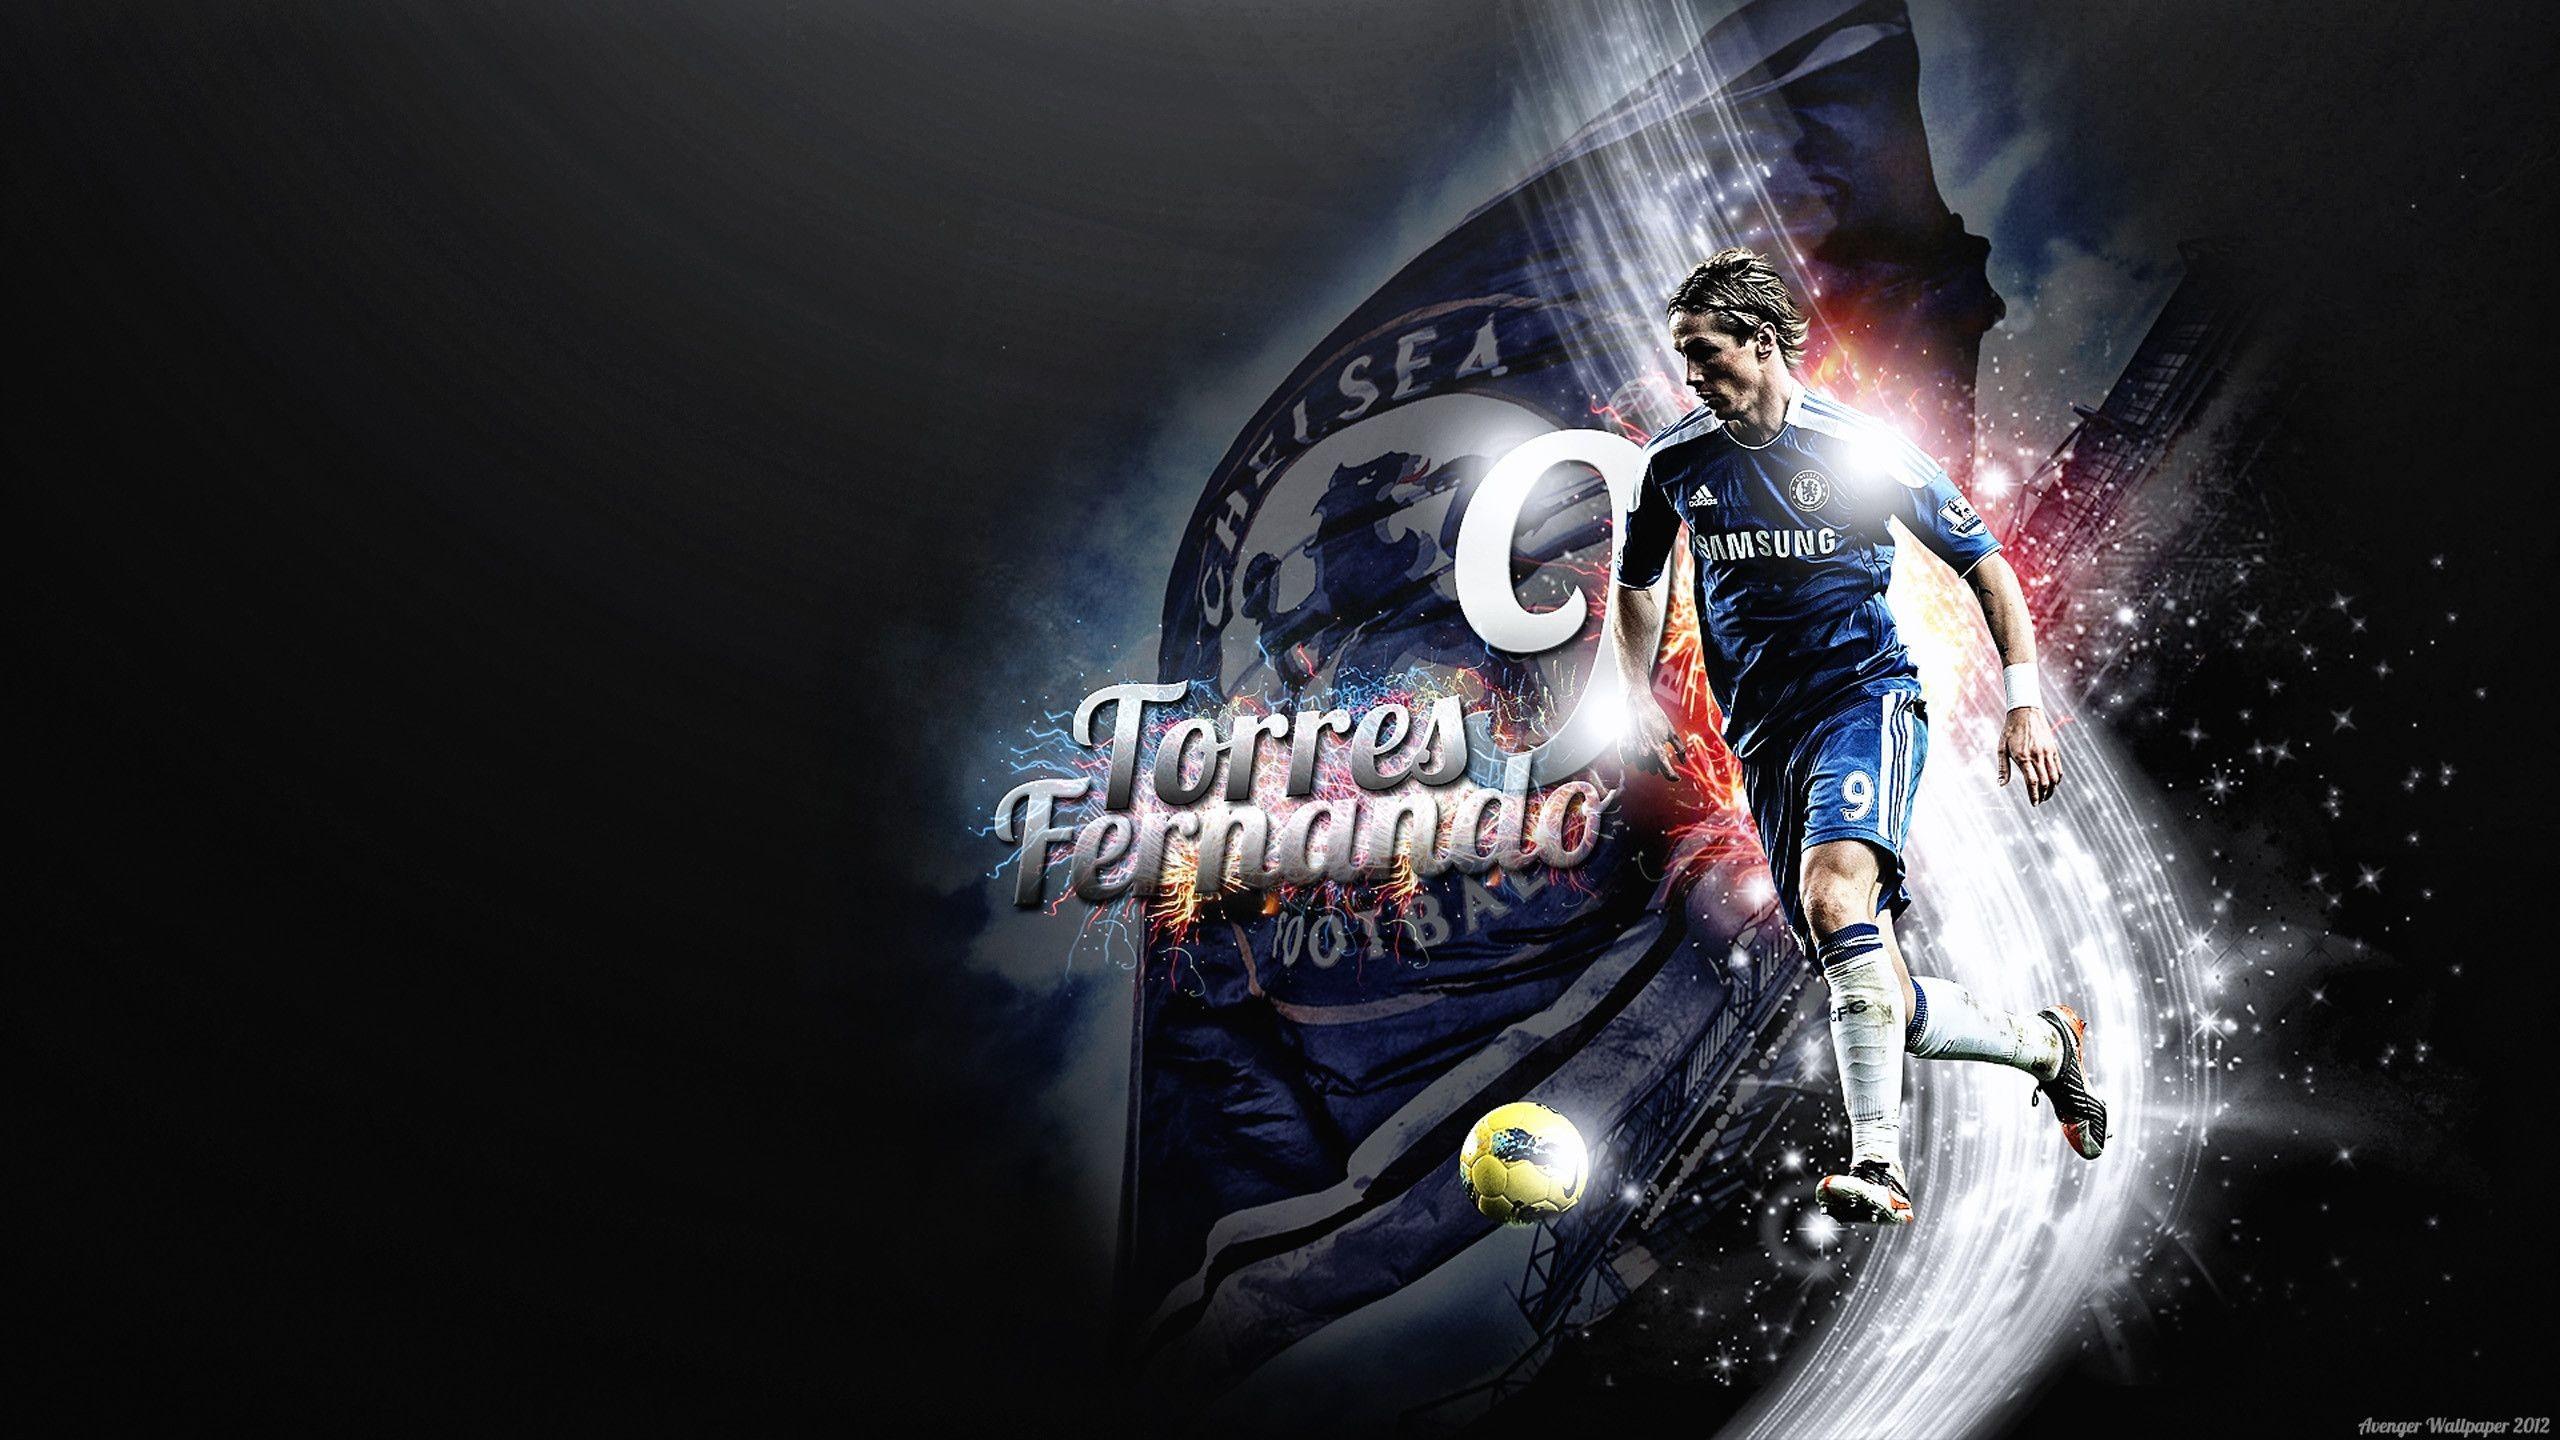 Football-Wallpaper-Widescreen-93 chelsea wallpapers HD free .